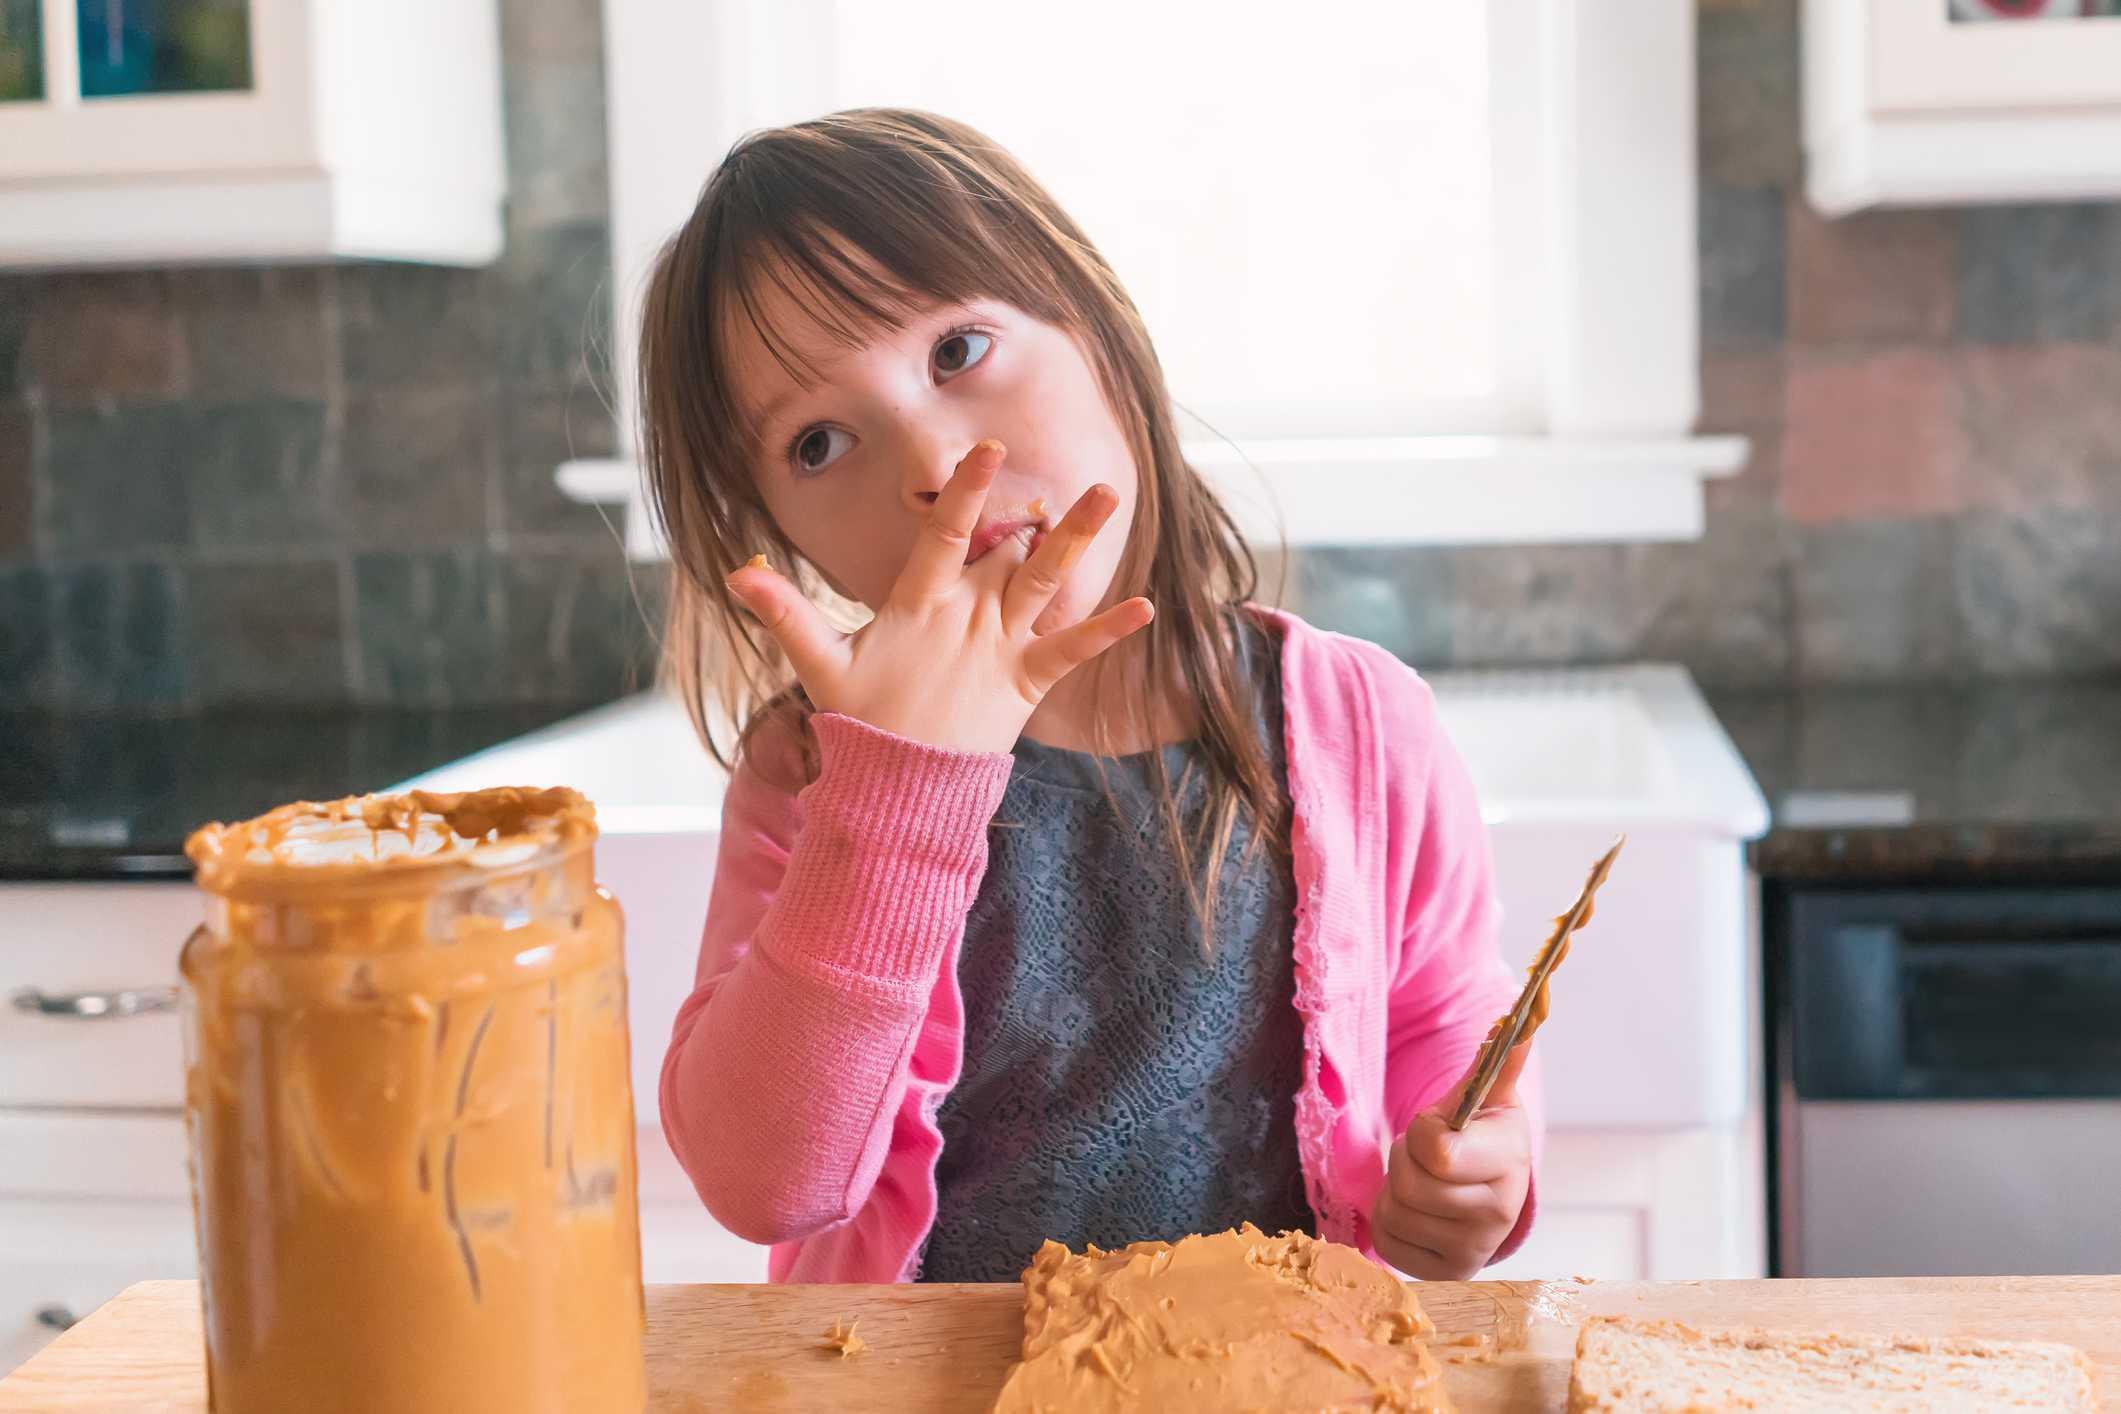 Little girl making peanut butter sandwich